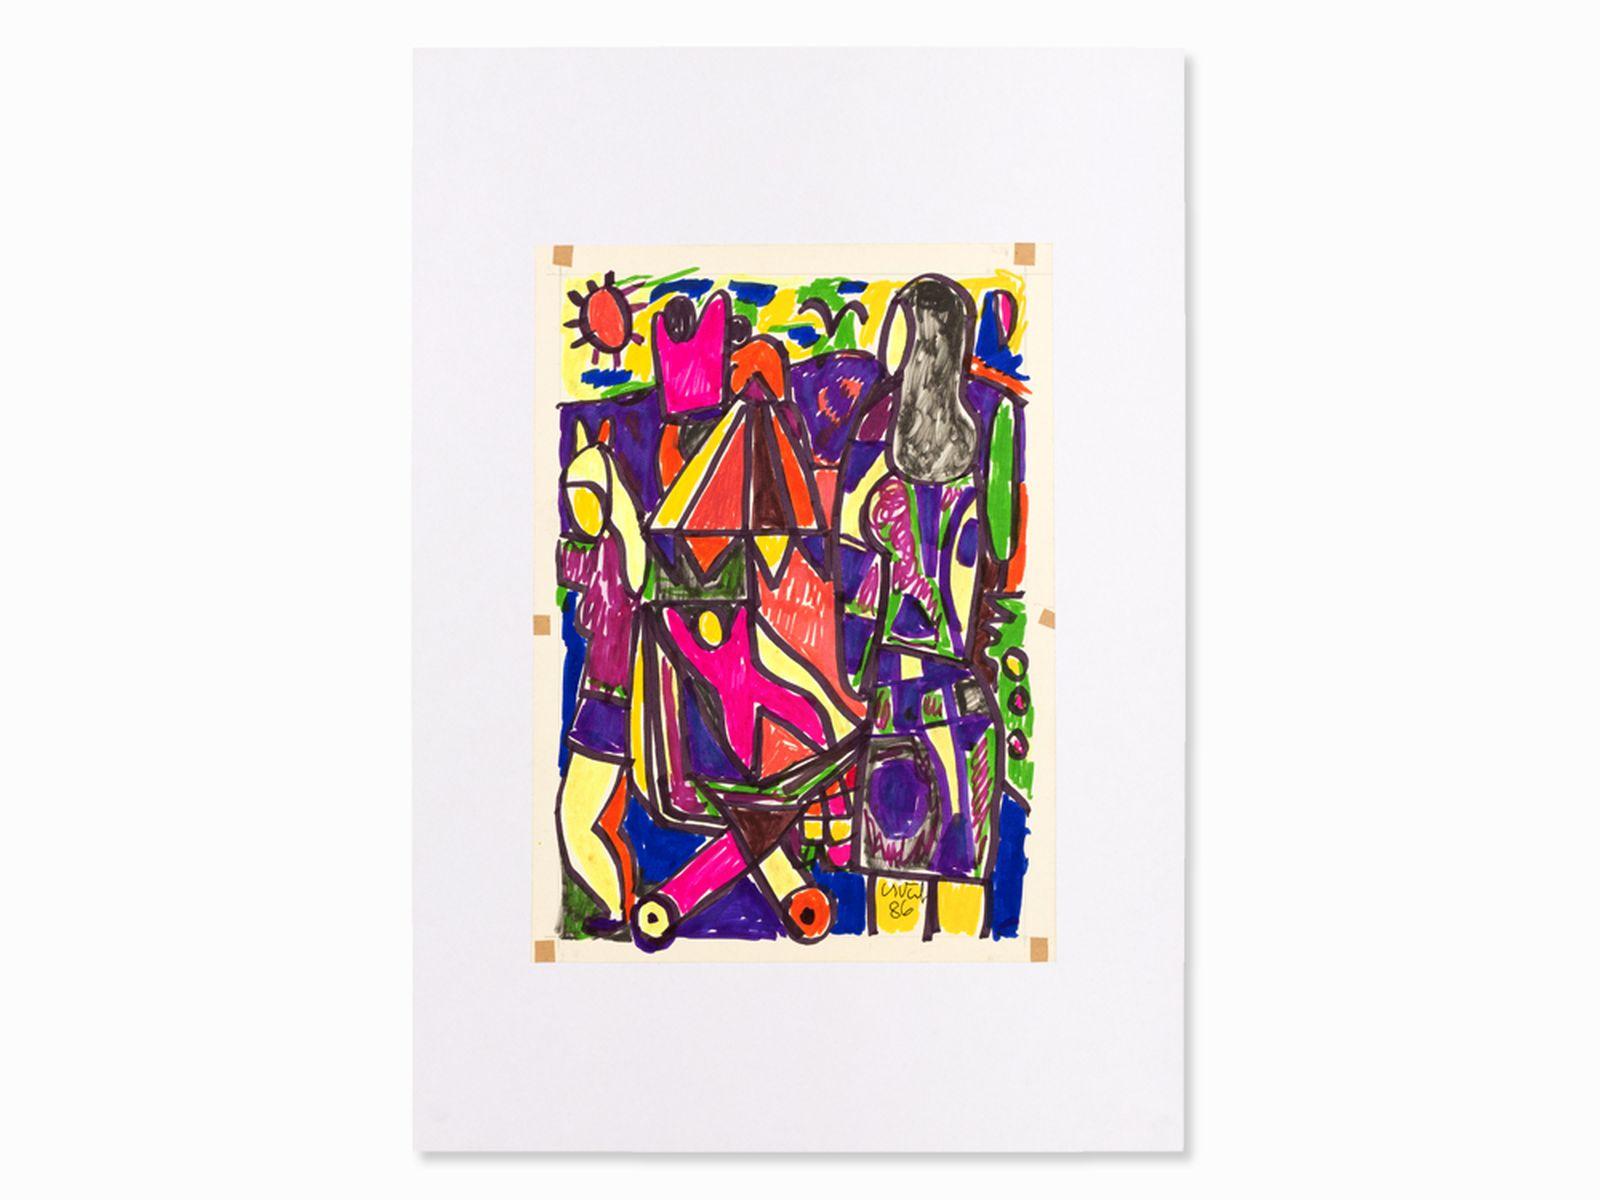 #20 Miklos Németh, Drawing, Powerful Composition, Hungary, 1986 | Miklos Németh, Zeichnung, Intensive Komposition, Ungarn,´86 Image